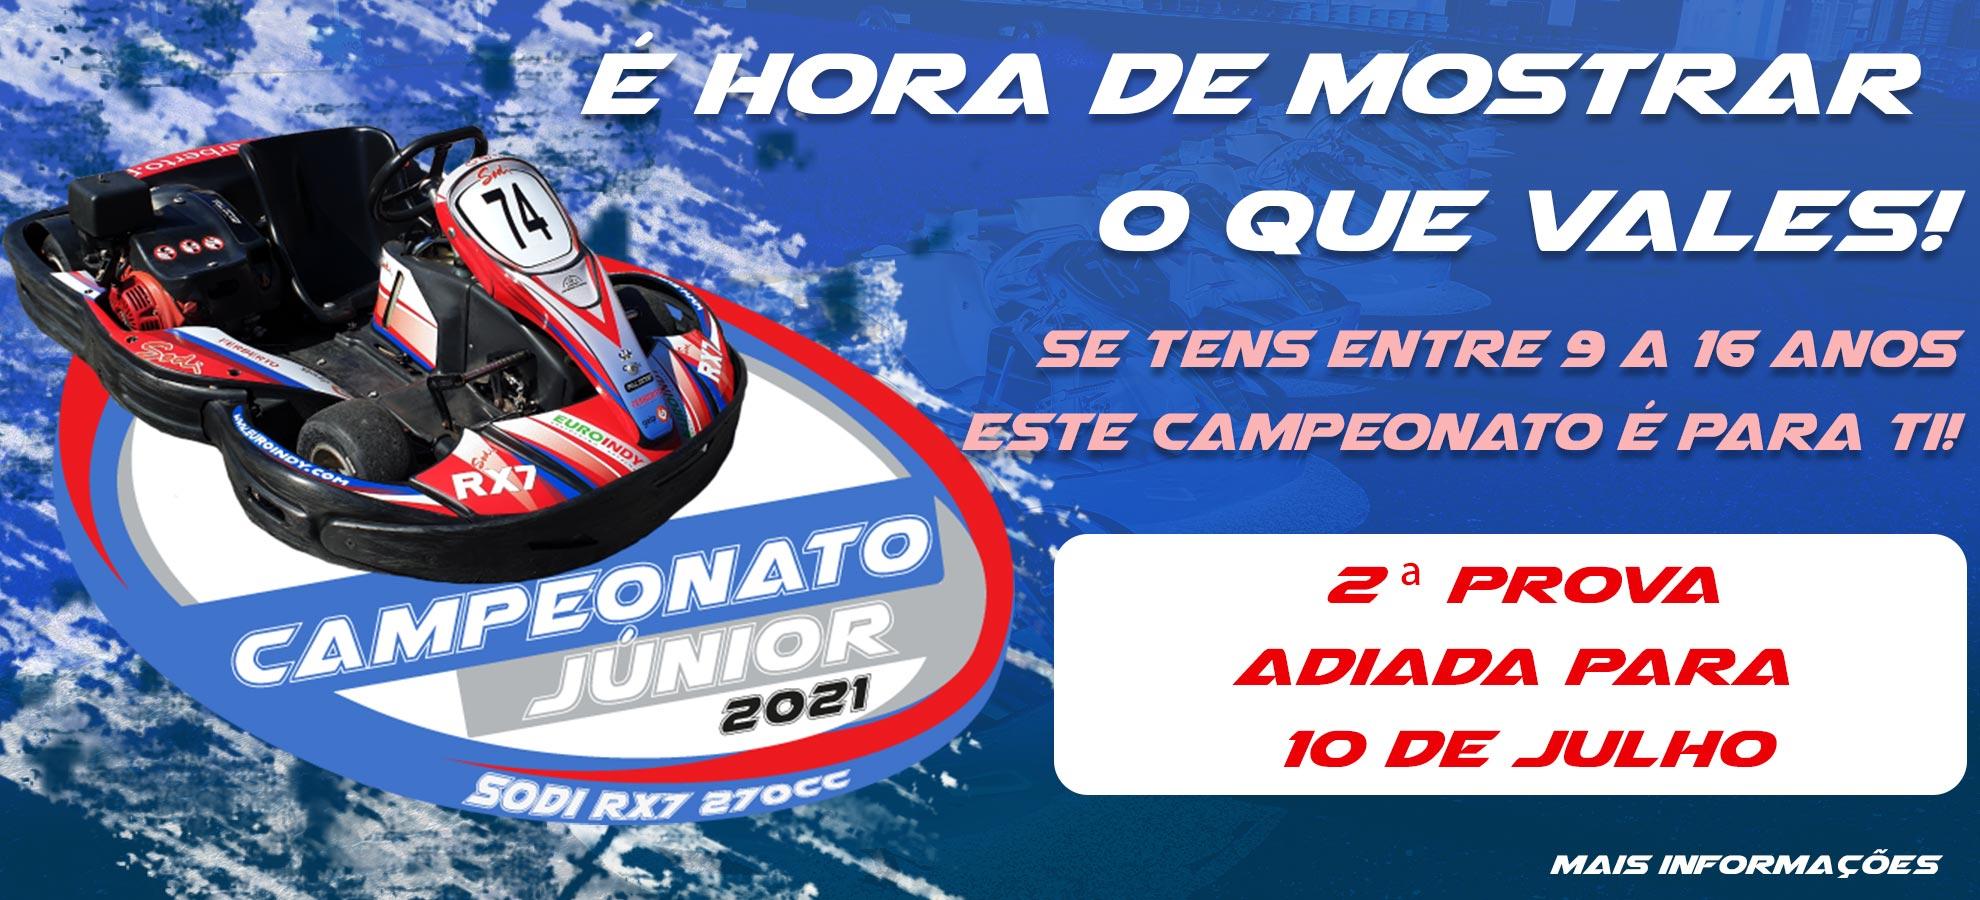 Campeonato Junior 2021